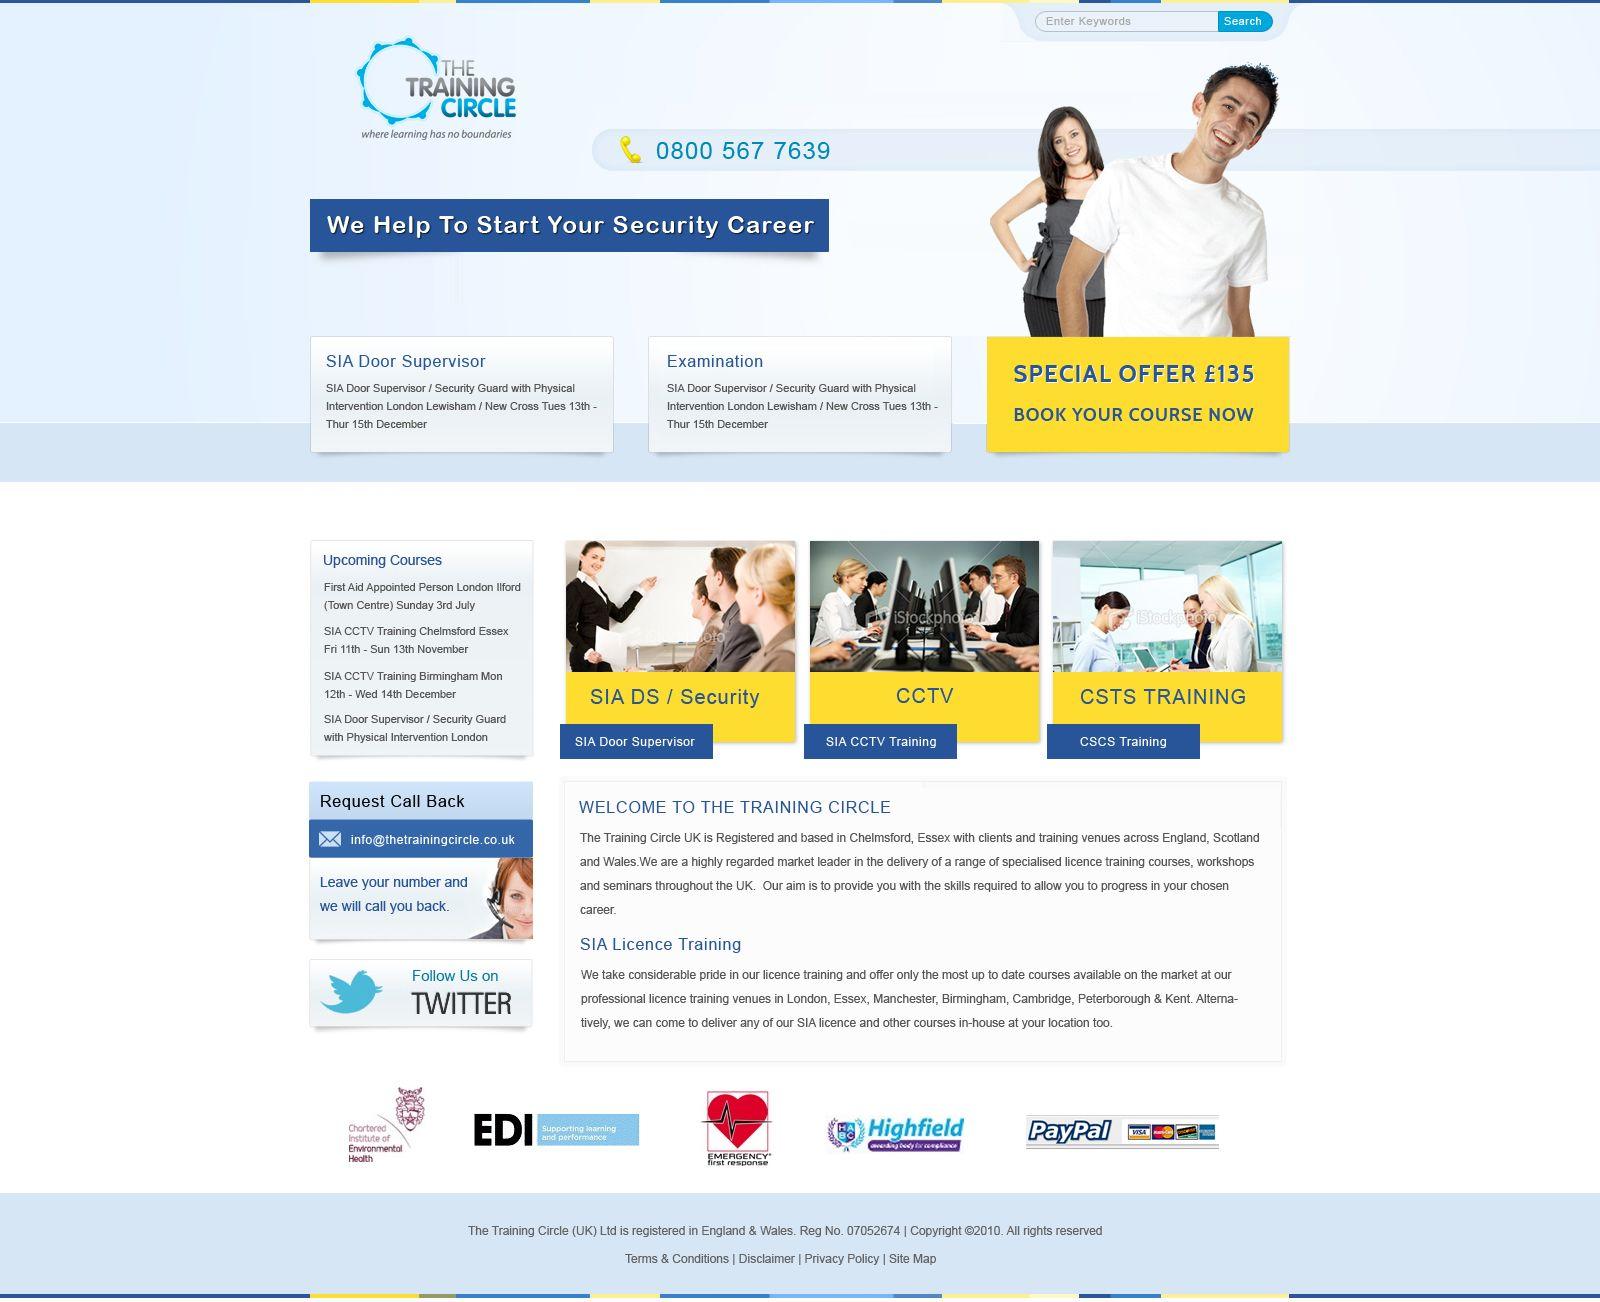 Mockup For Online Booking Call Backs Web Design Essex